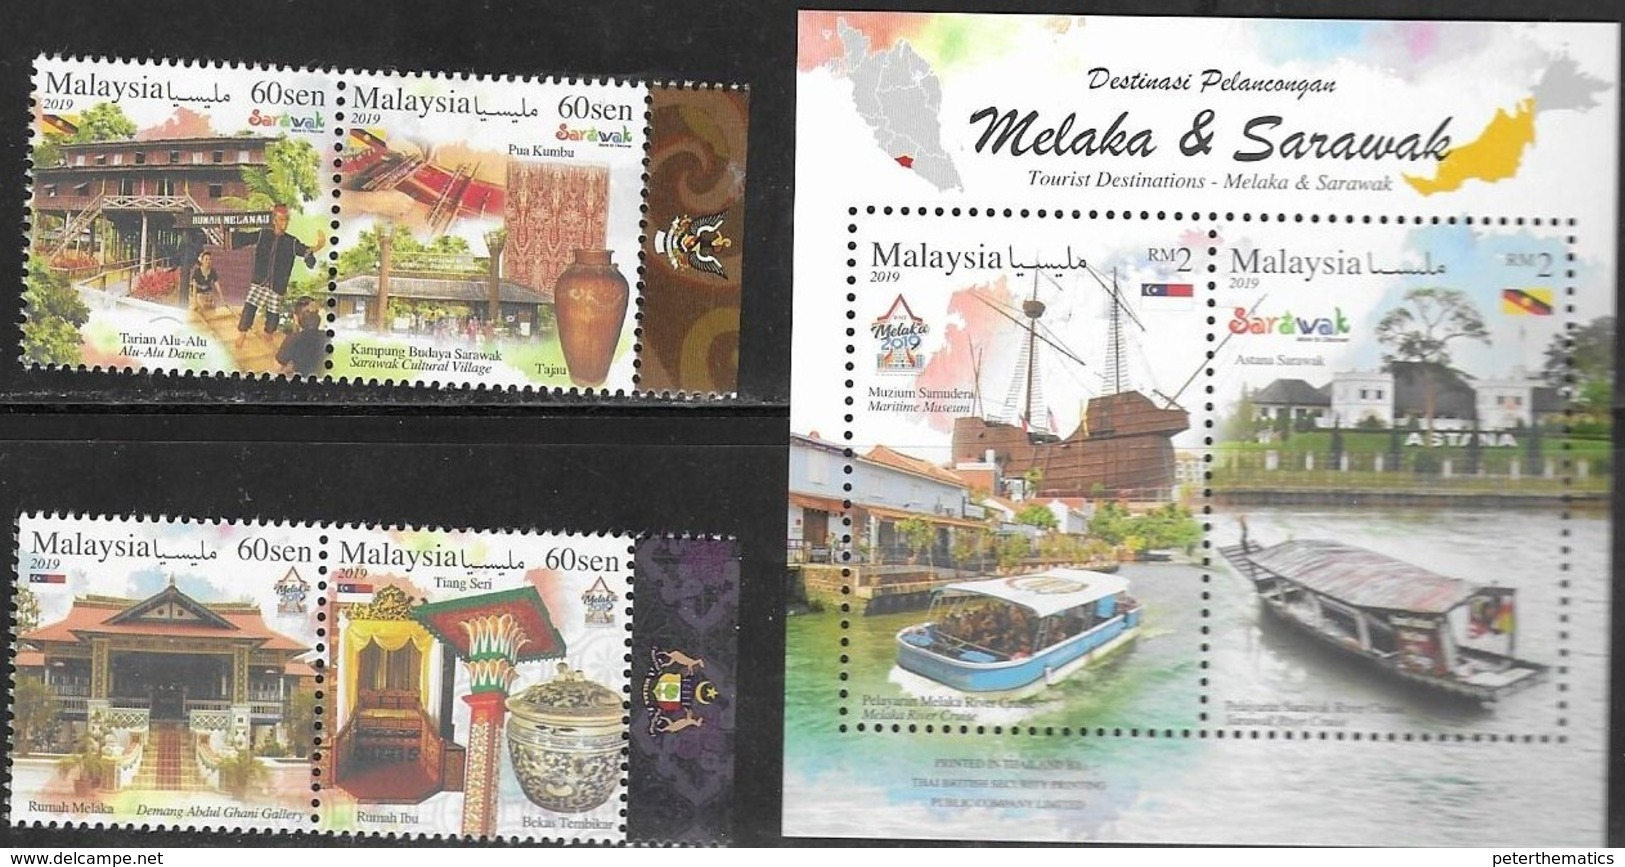 MALAYSIA, 2019, MNH,TOURISM, MELAKA, SARAWAK, SHIPS, BOATS, TEMPLES, 4v+S/SHEET - Holidays & Tourism